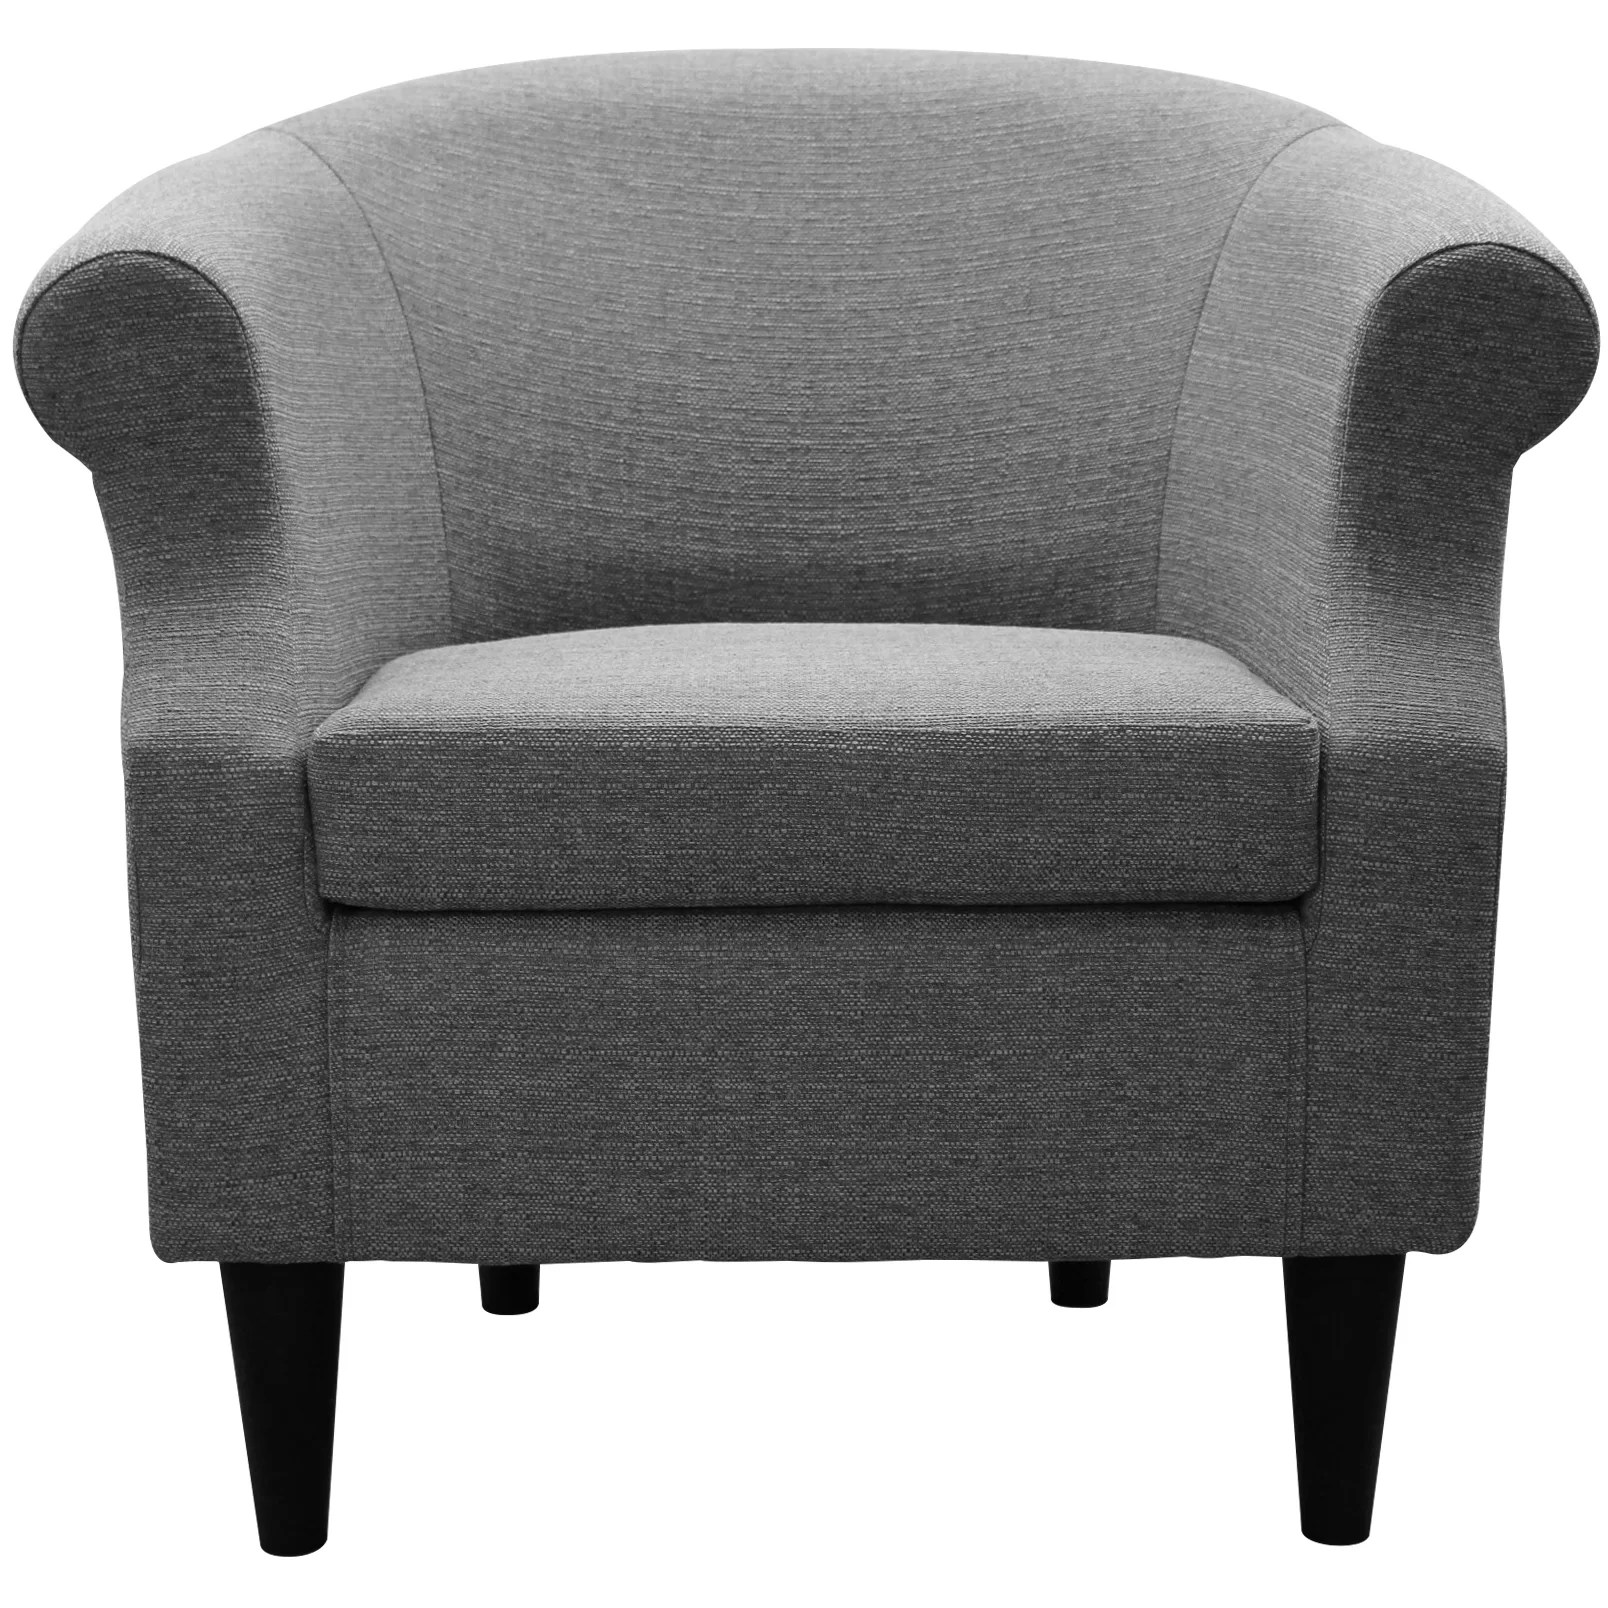 Latitude Run Marsdeni Club Chair  Reviews  Wayfair